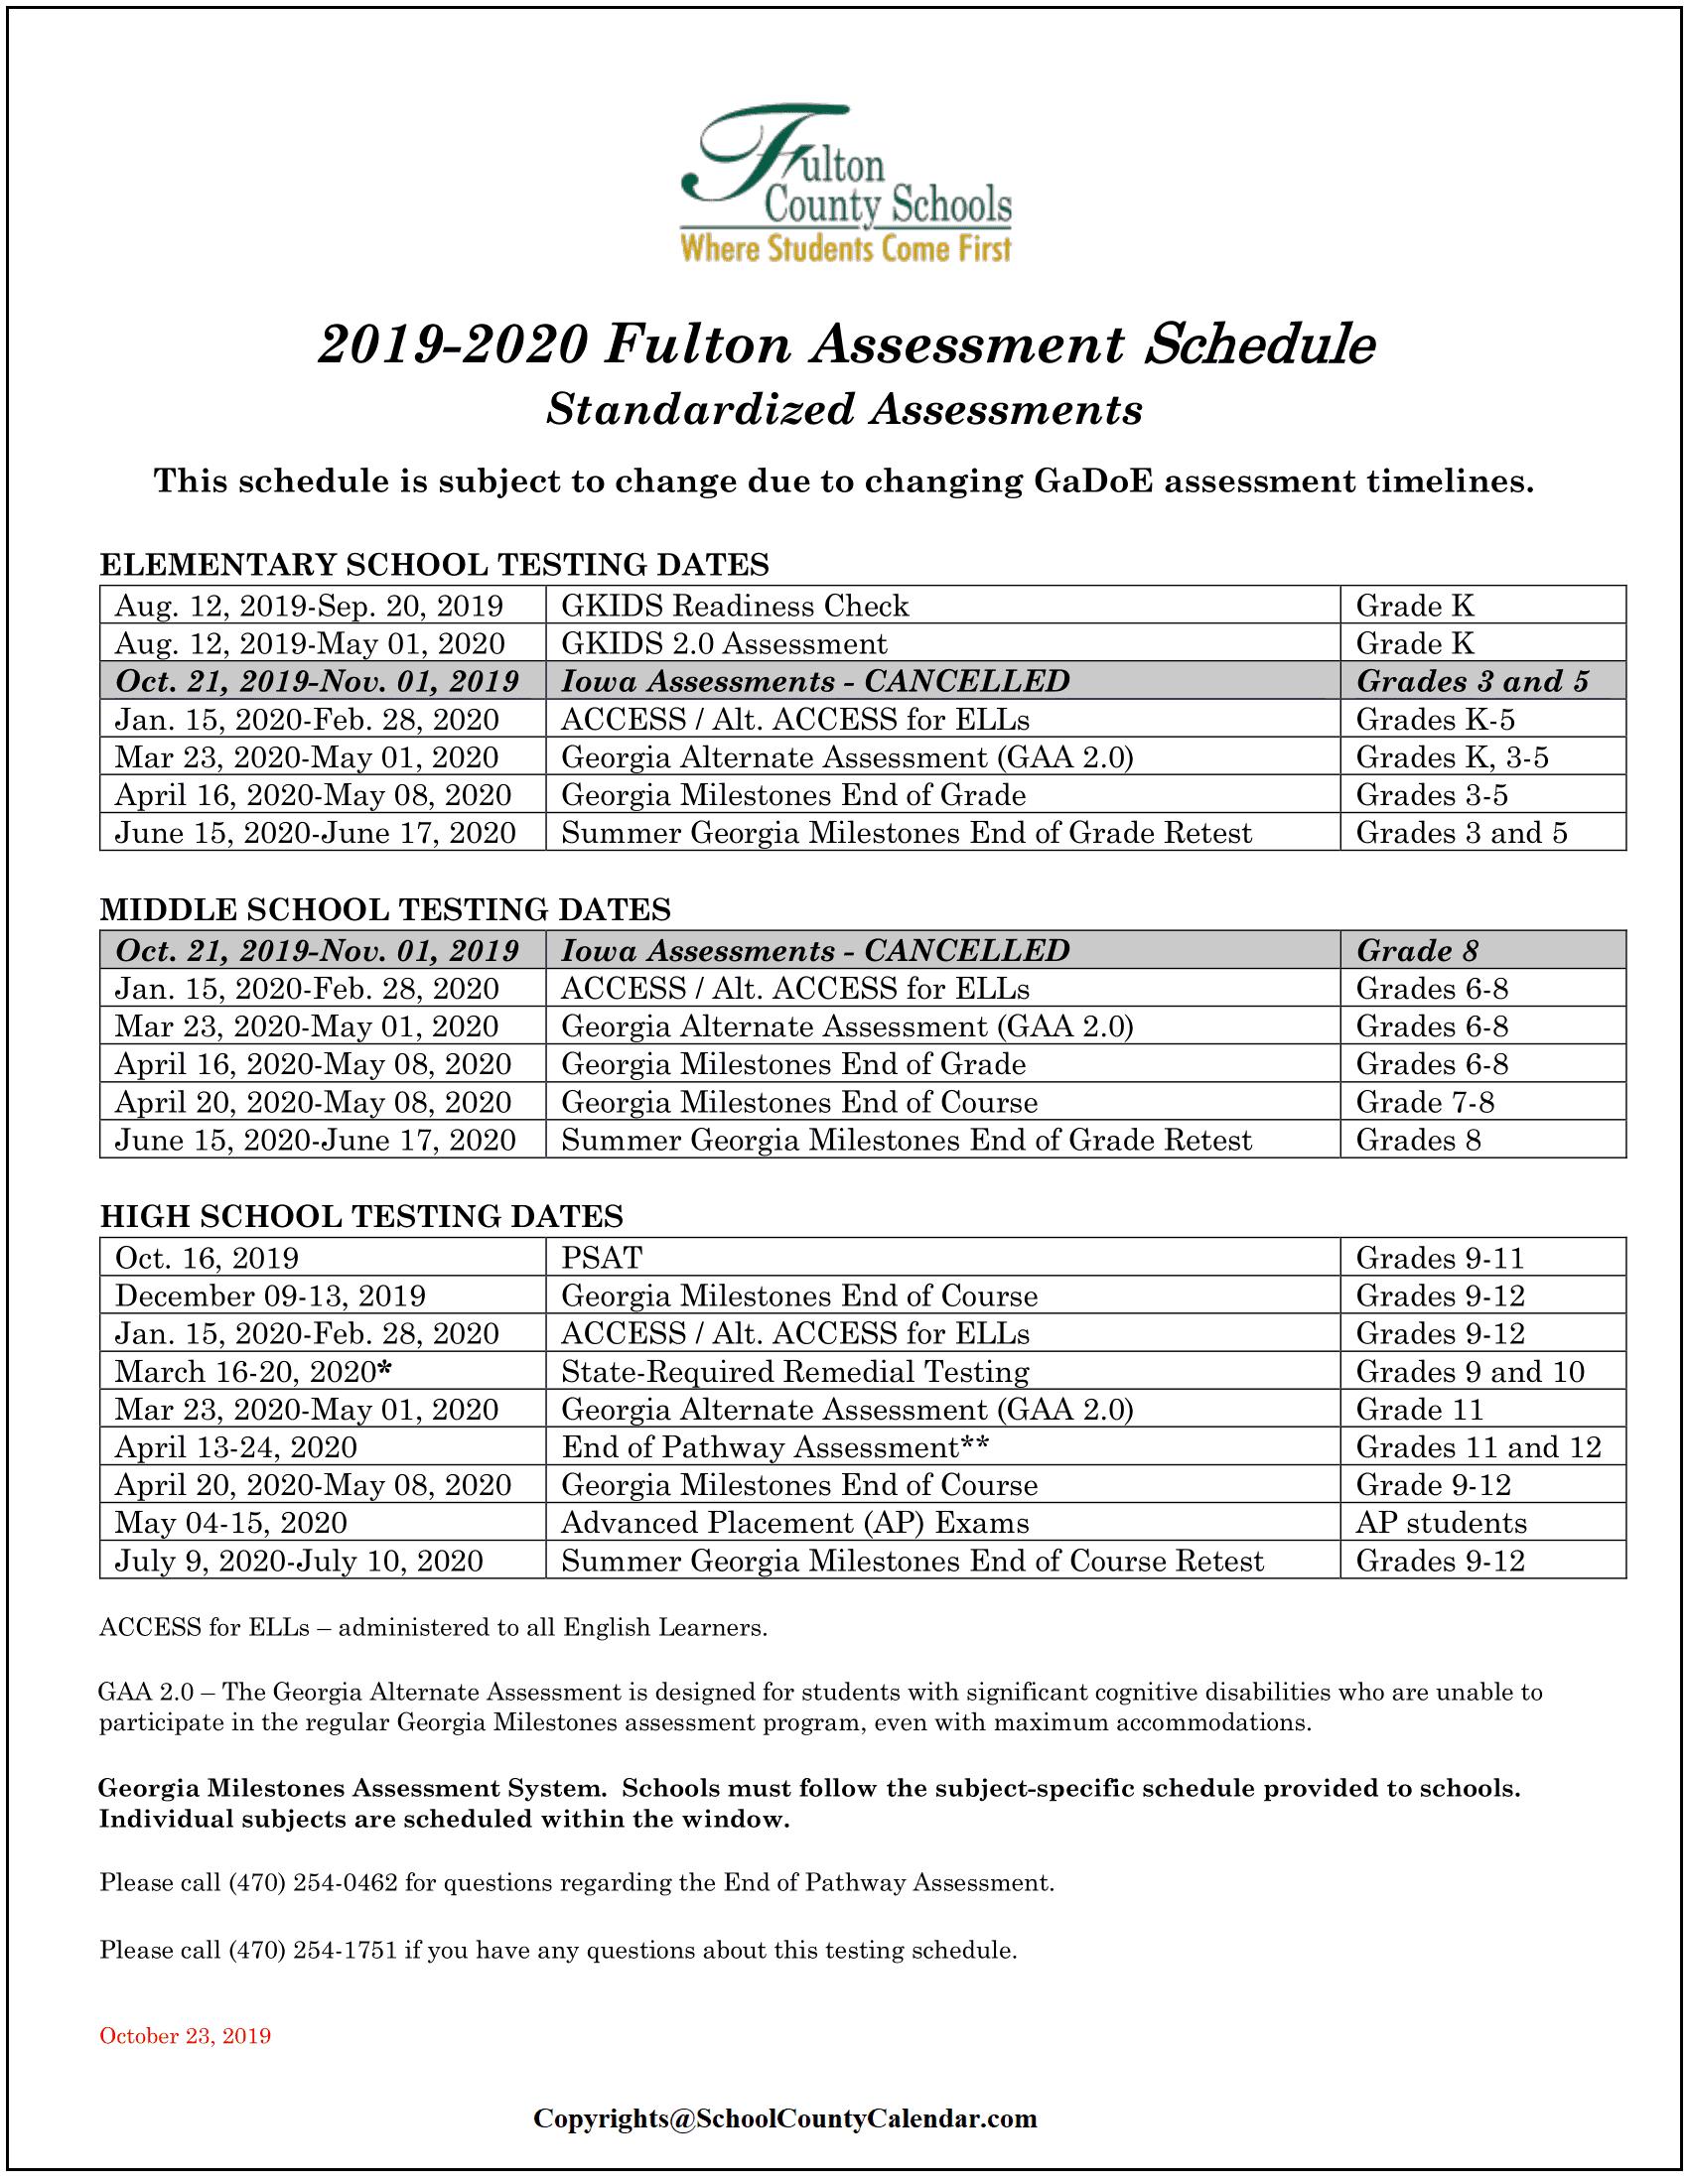 Fulton County Schools Calendar 2022.Fulton County School Calendar 2021 22 Important Update County School Calendar